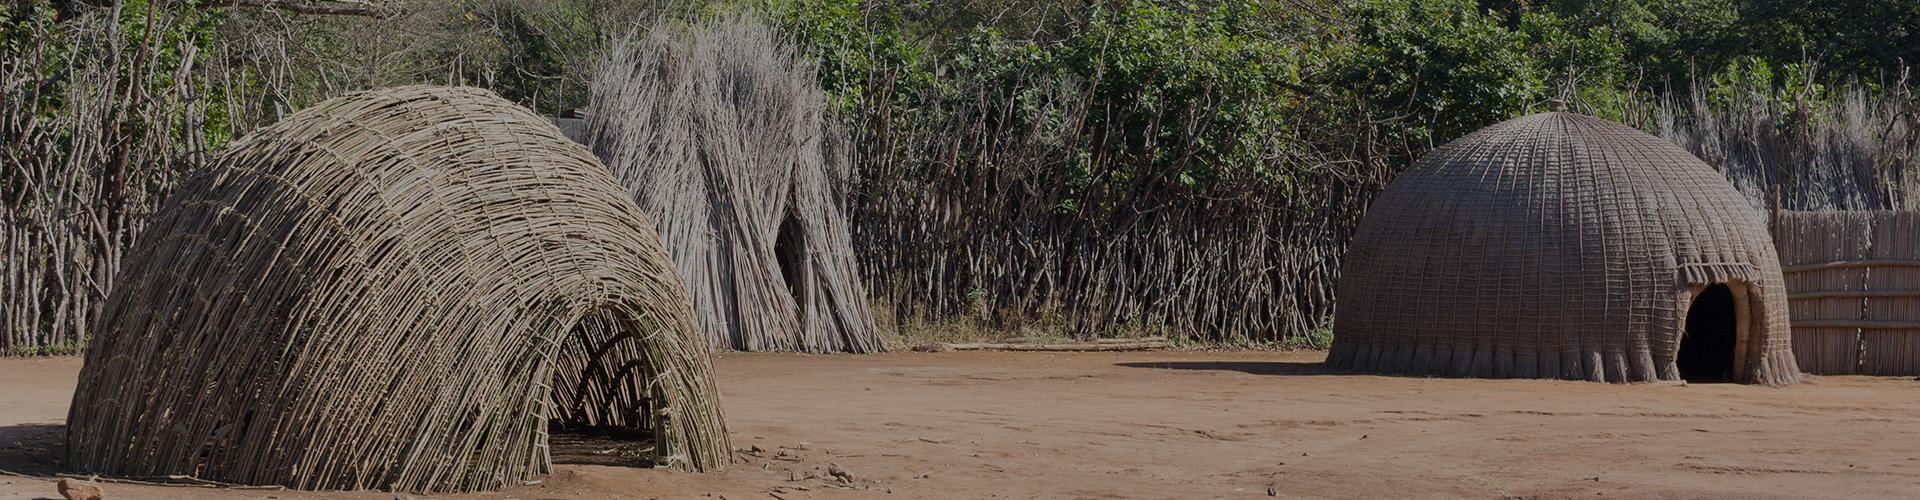 Landmark photograph of Swaziland